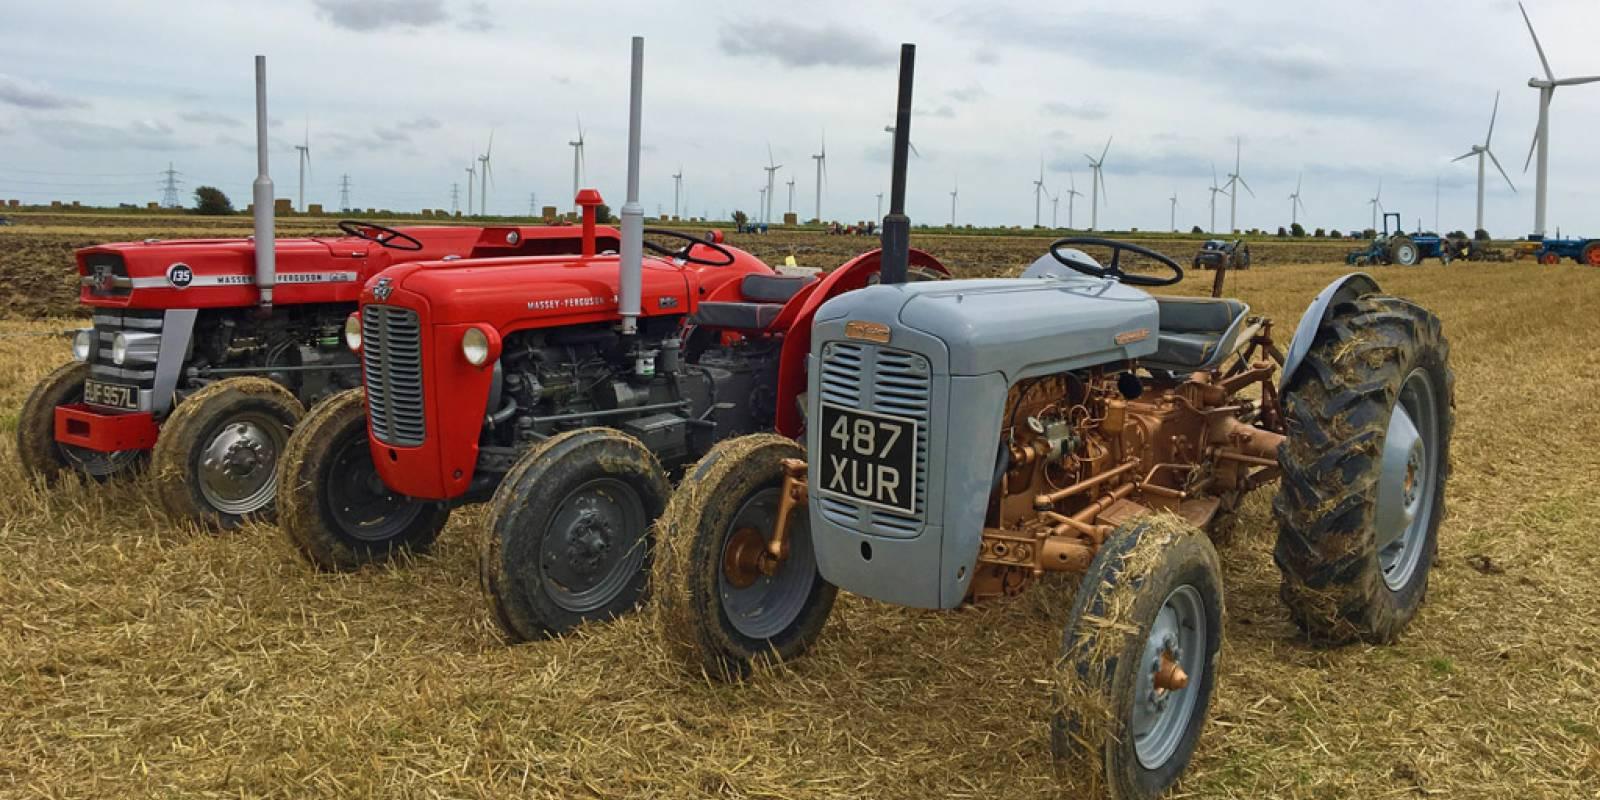 Romney-Marsh-Ploughing-Match-2017-tractors.jpg